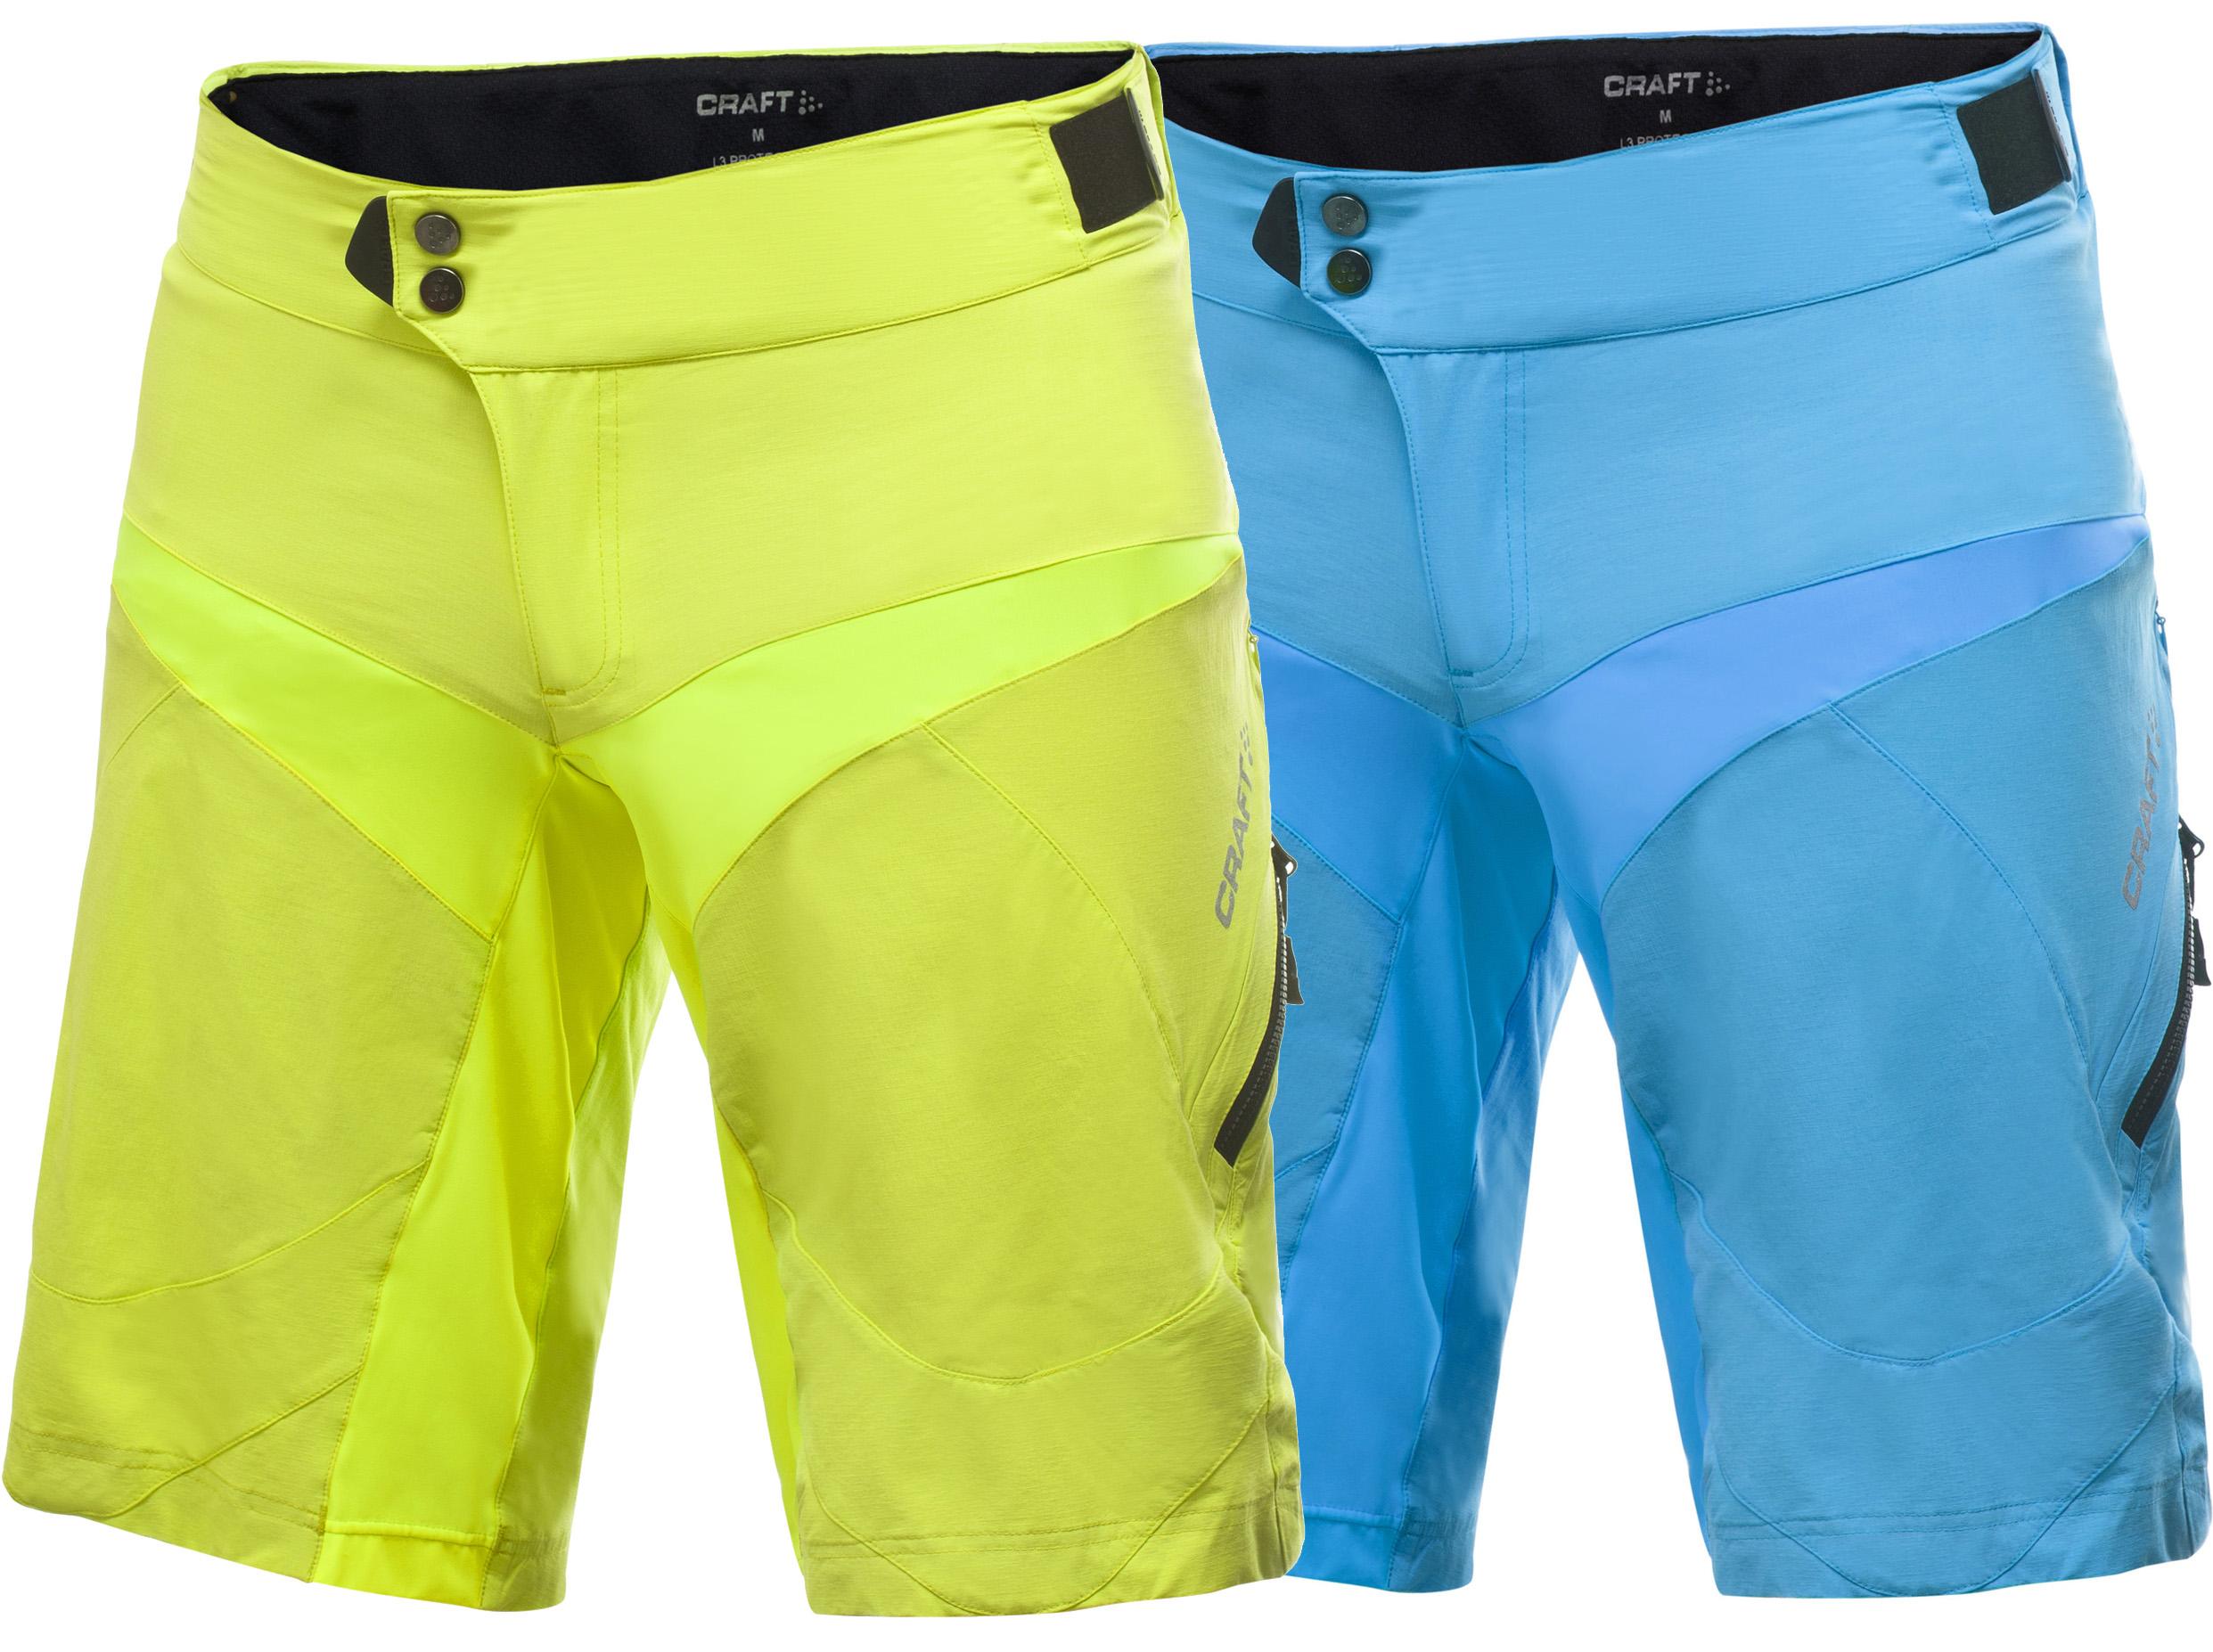 Craft neue loose fit bikewear kollektion mtb for Craft mountain bike clothing